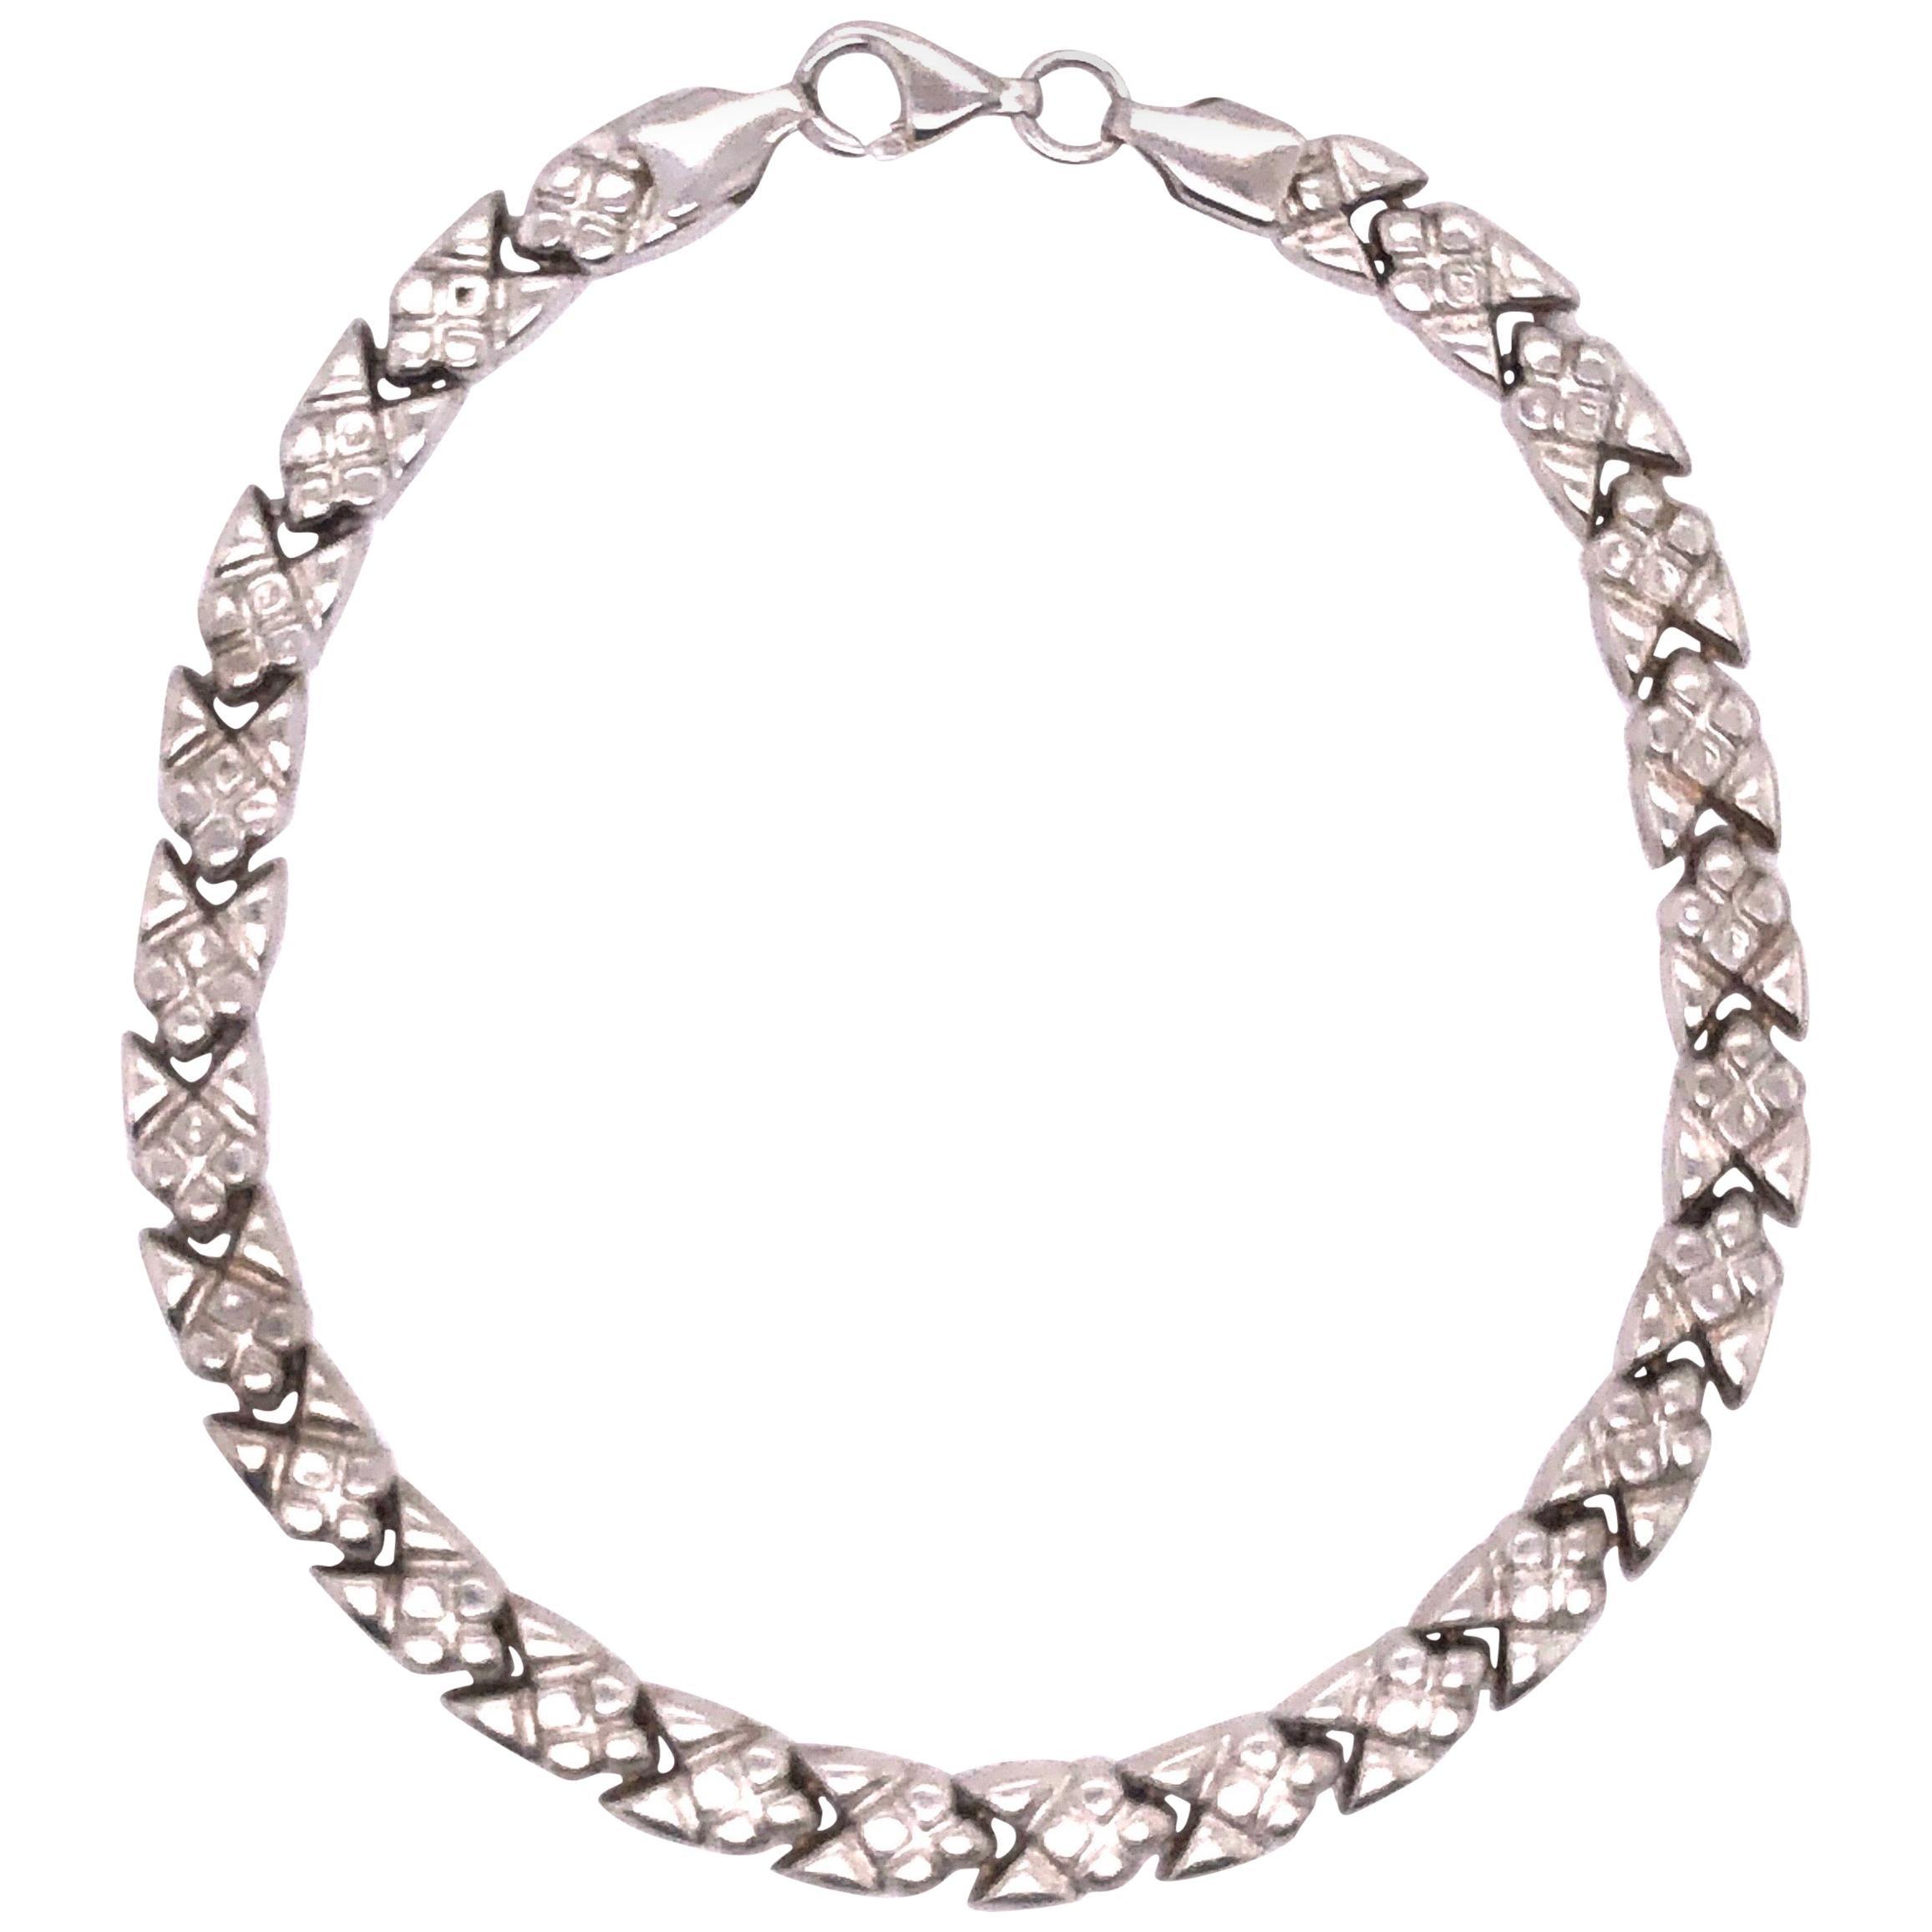 14 Karat White Gold Fancy Link Bracelet